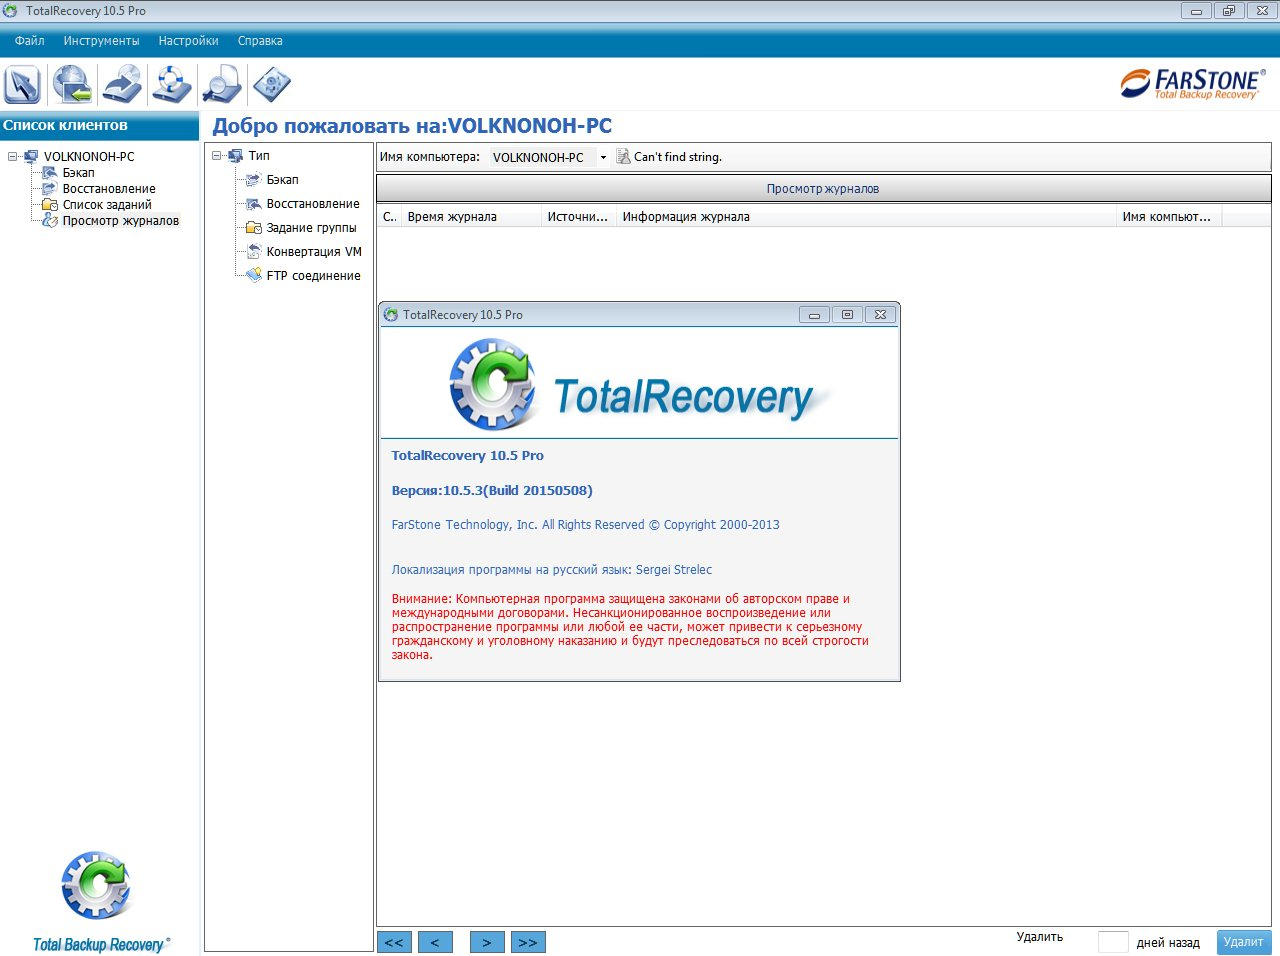 FarStone TotalRecovery